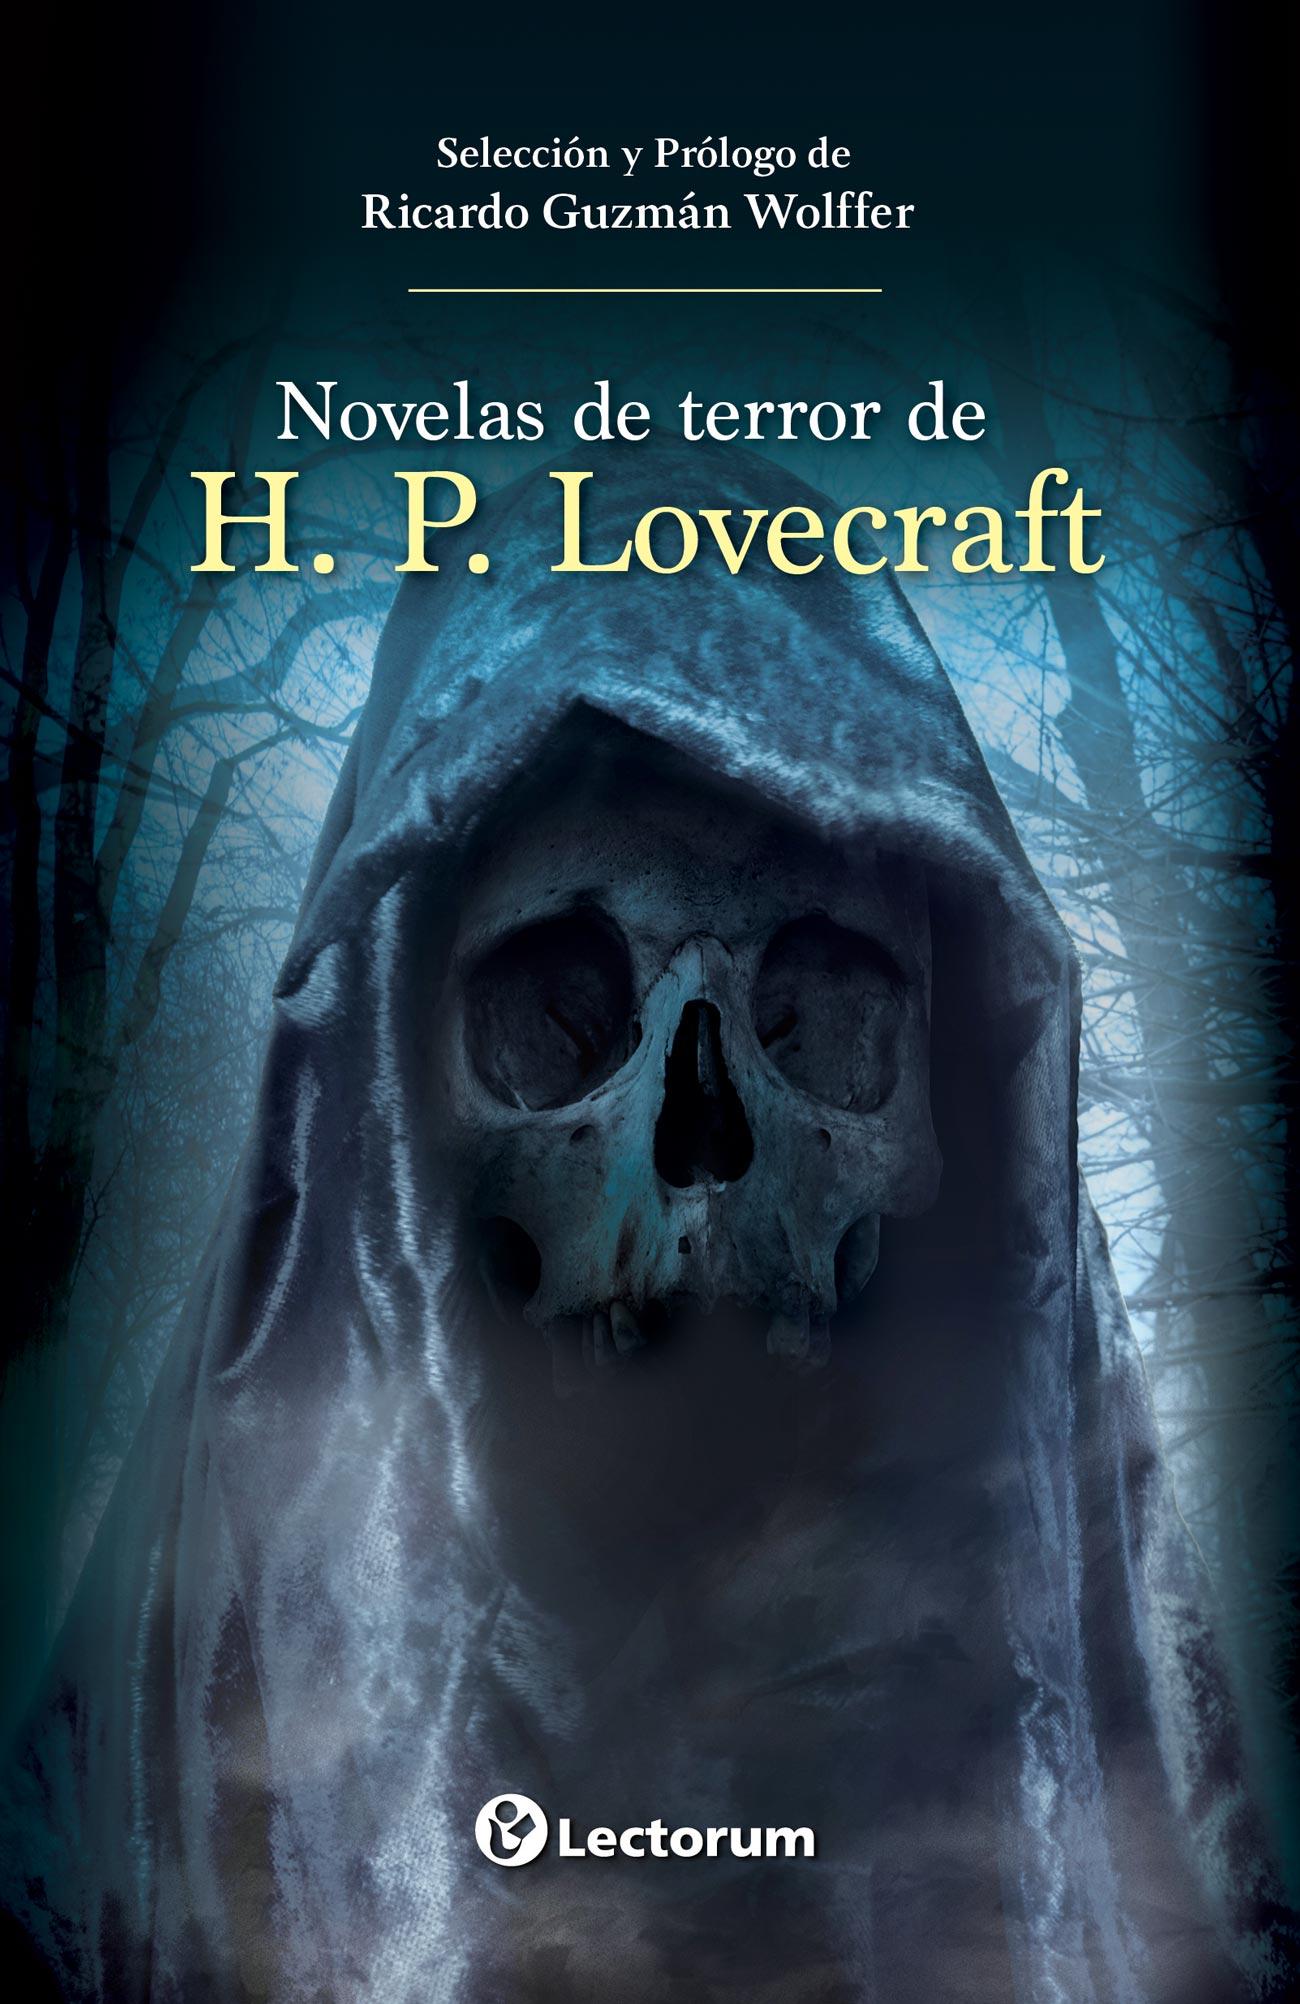 Novelas de terror de H.P. Lovecraft